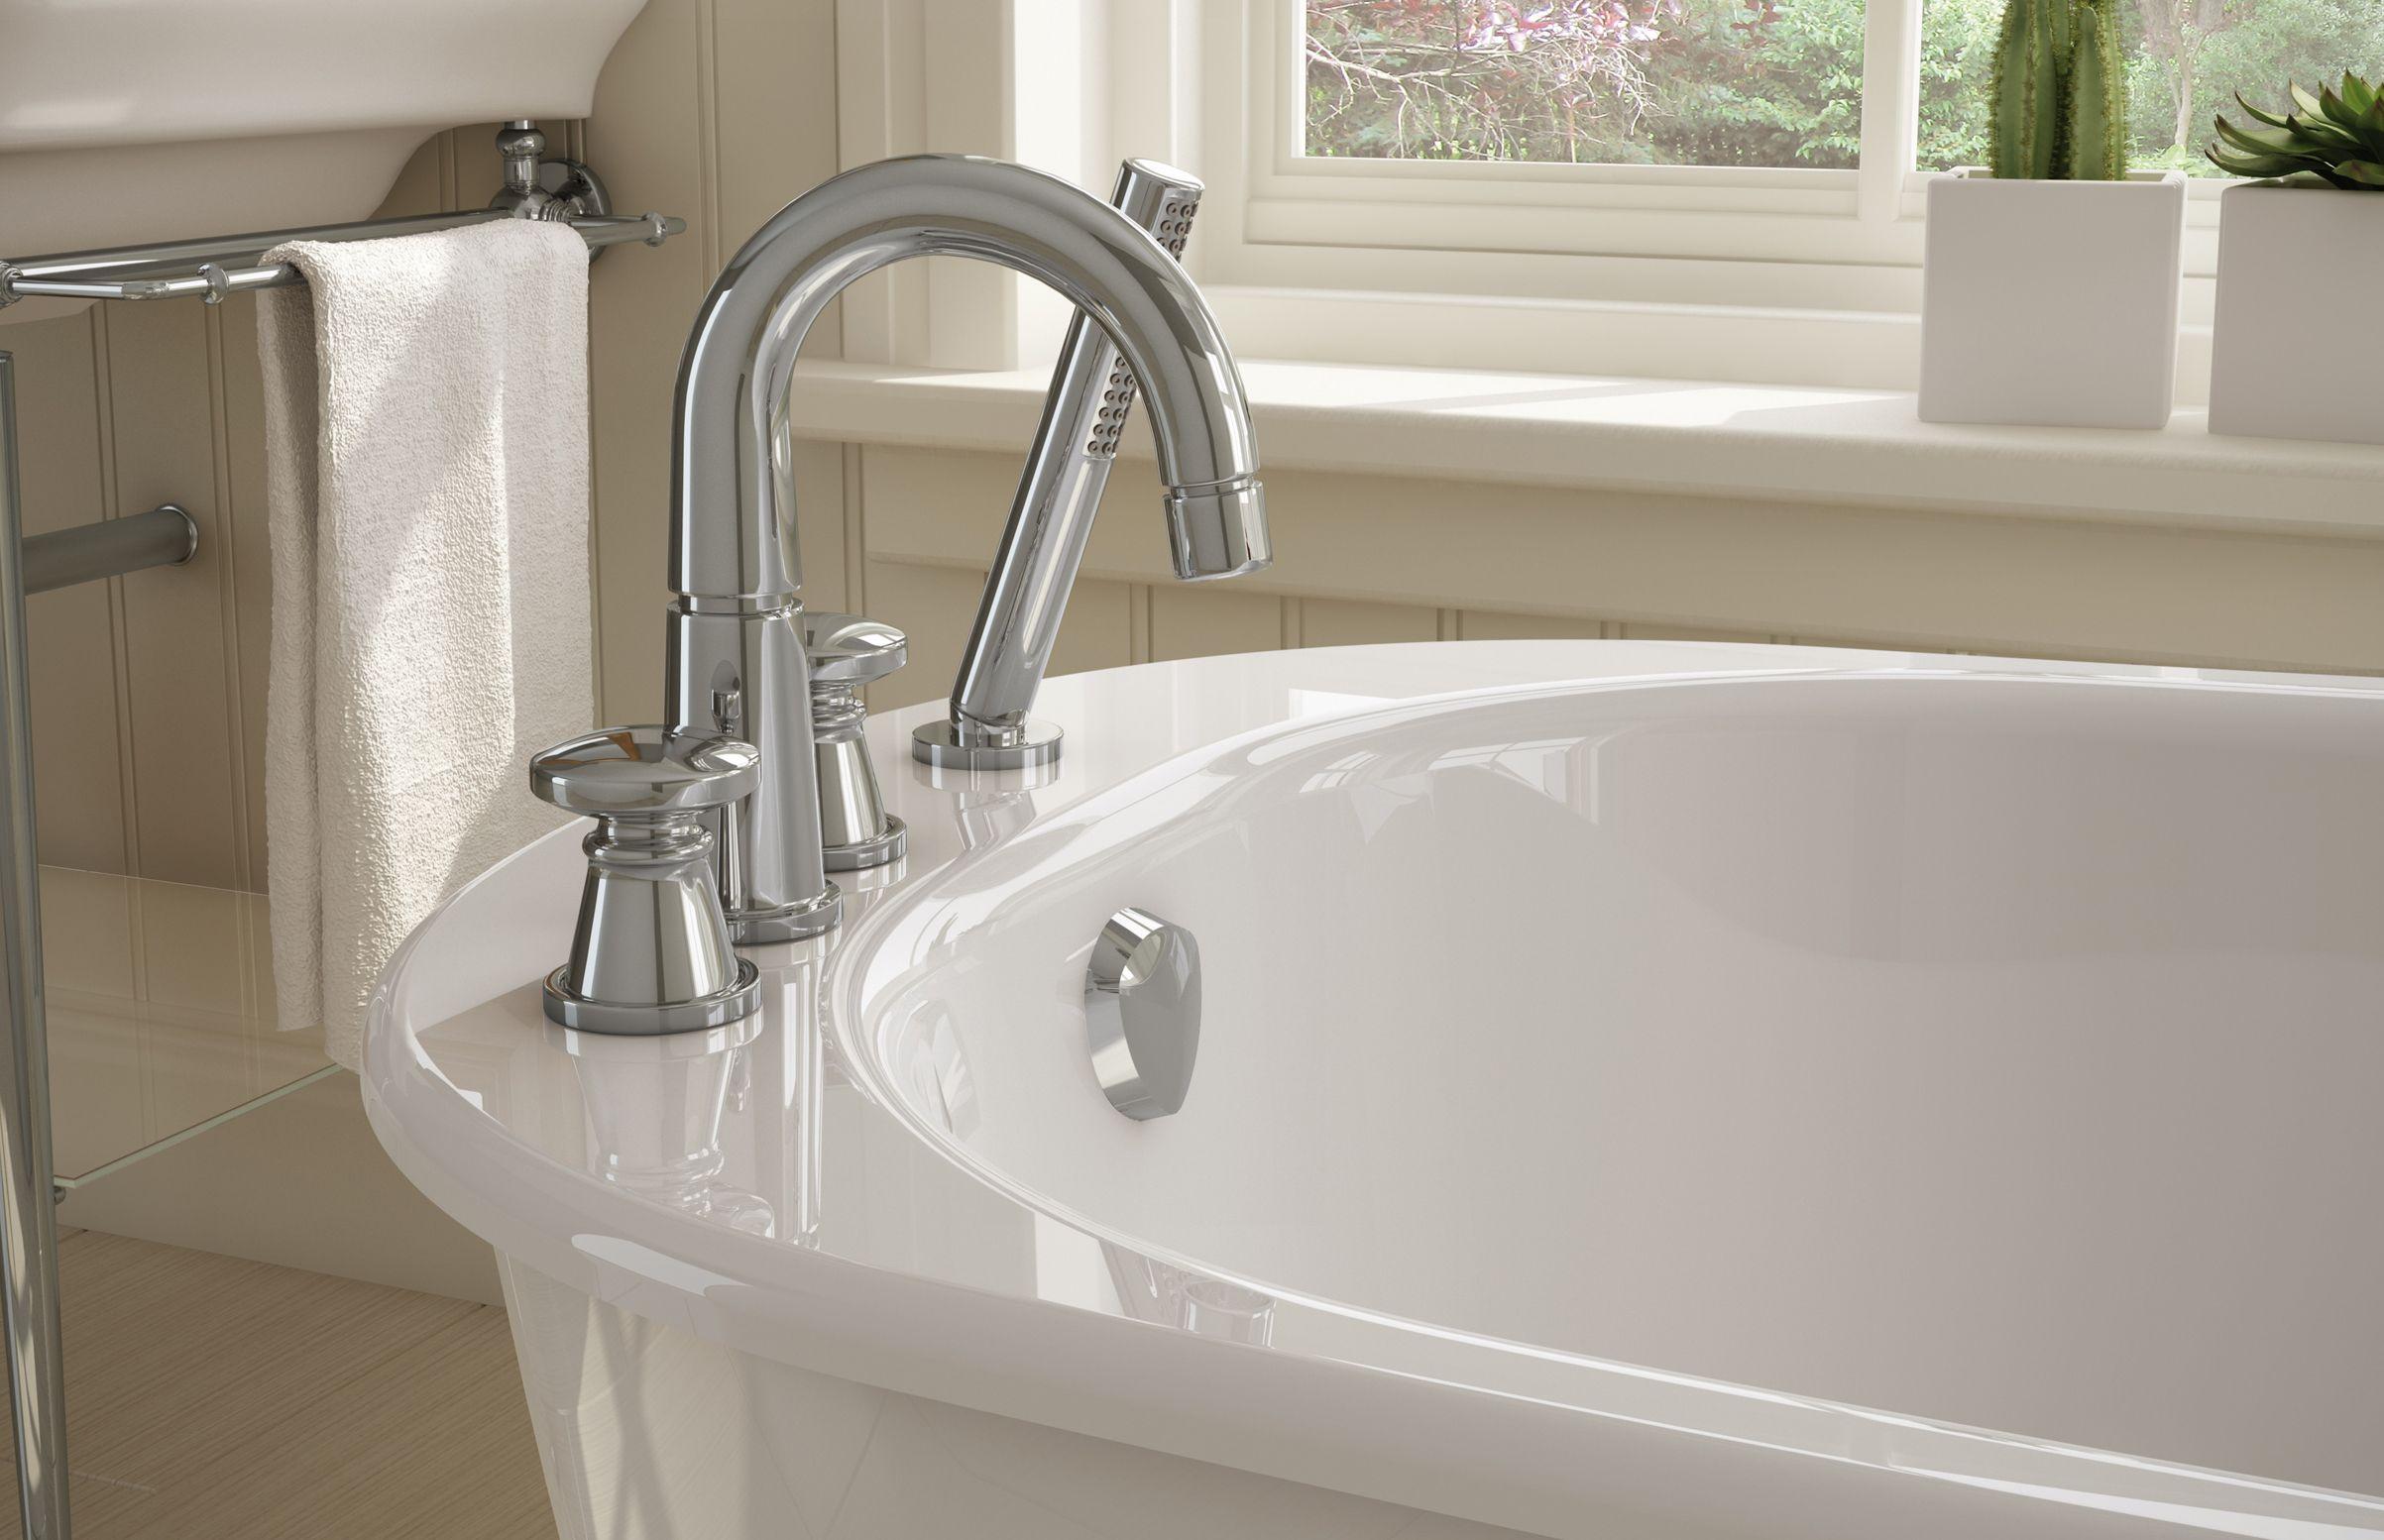 SAX Freestanding Bathtub - MAAX Bath Inc.   Home   Pinterest ...